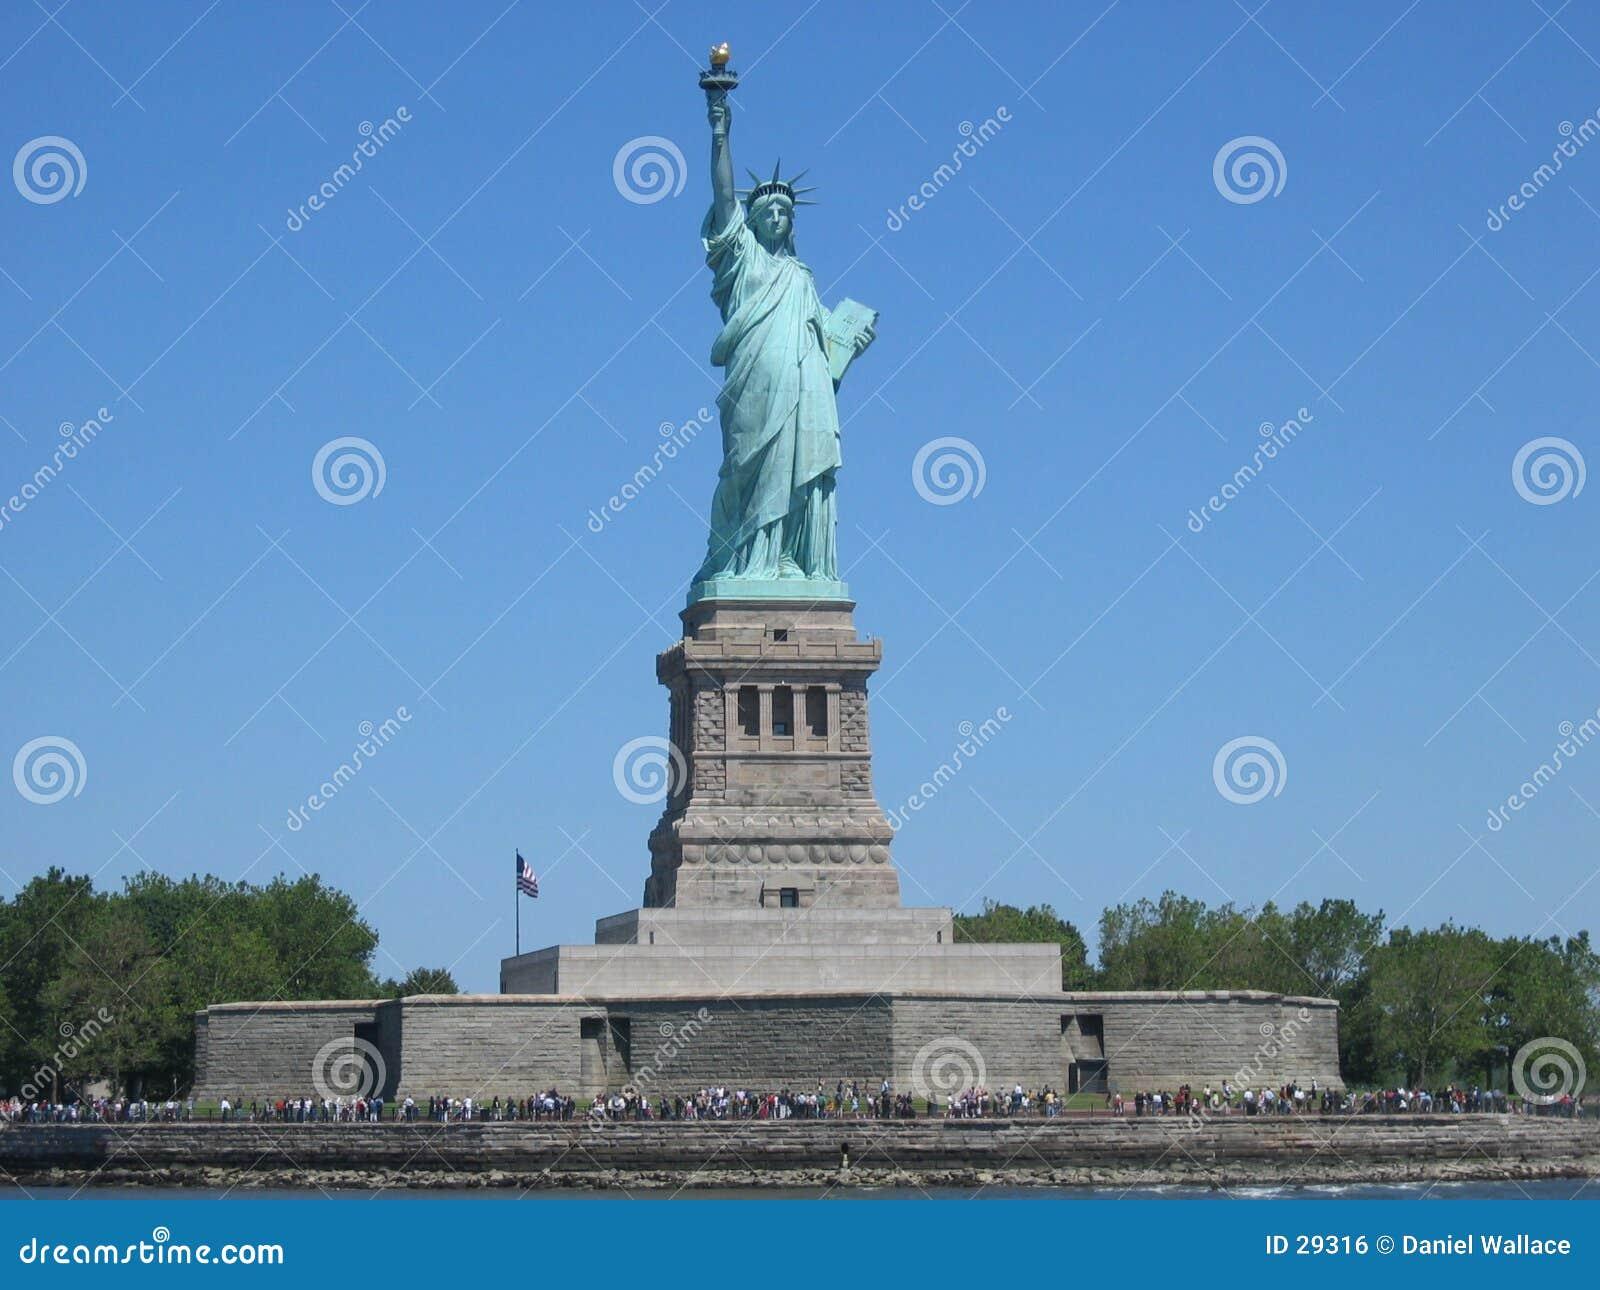 Download Estatua de la libertad foto de archivo. Imagen de grande - 29316